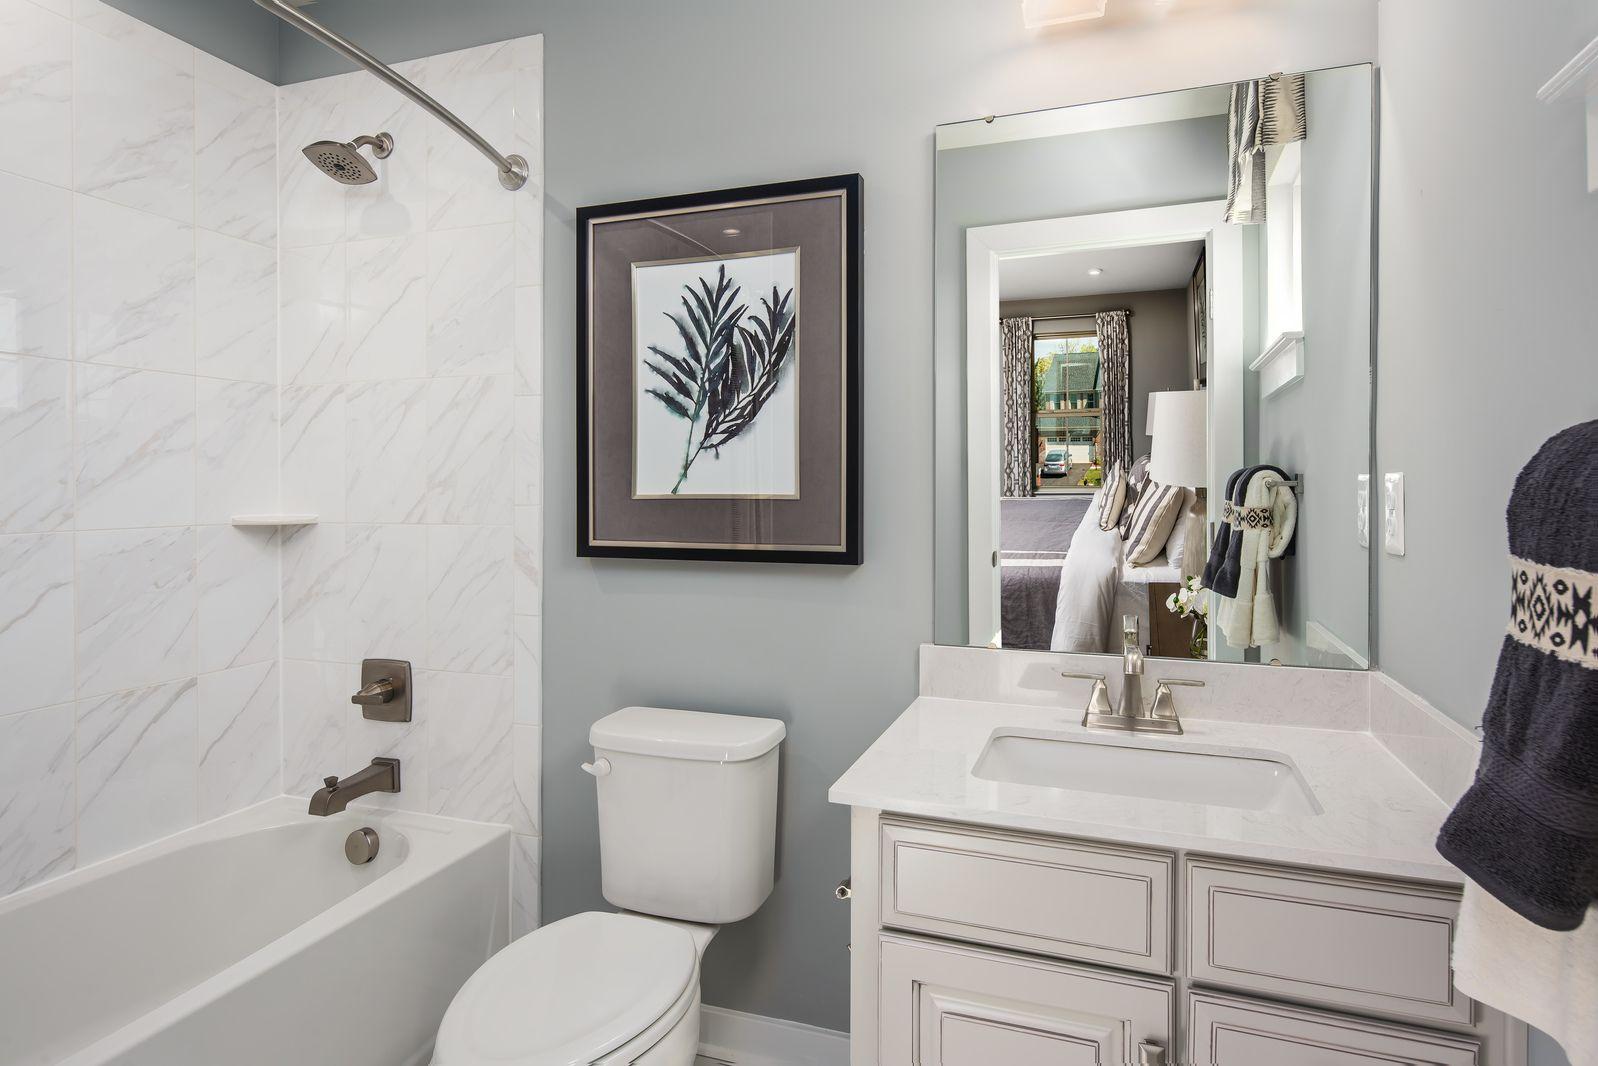 Bathroom featured in the Roanoke By Ryan Homes in Philadelphia, NJ